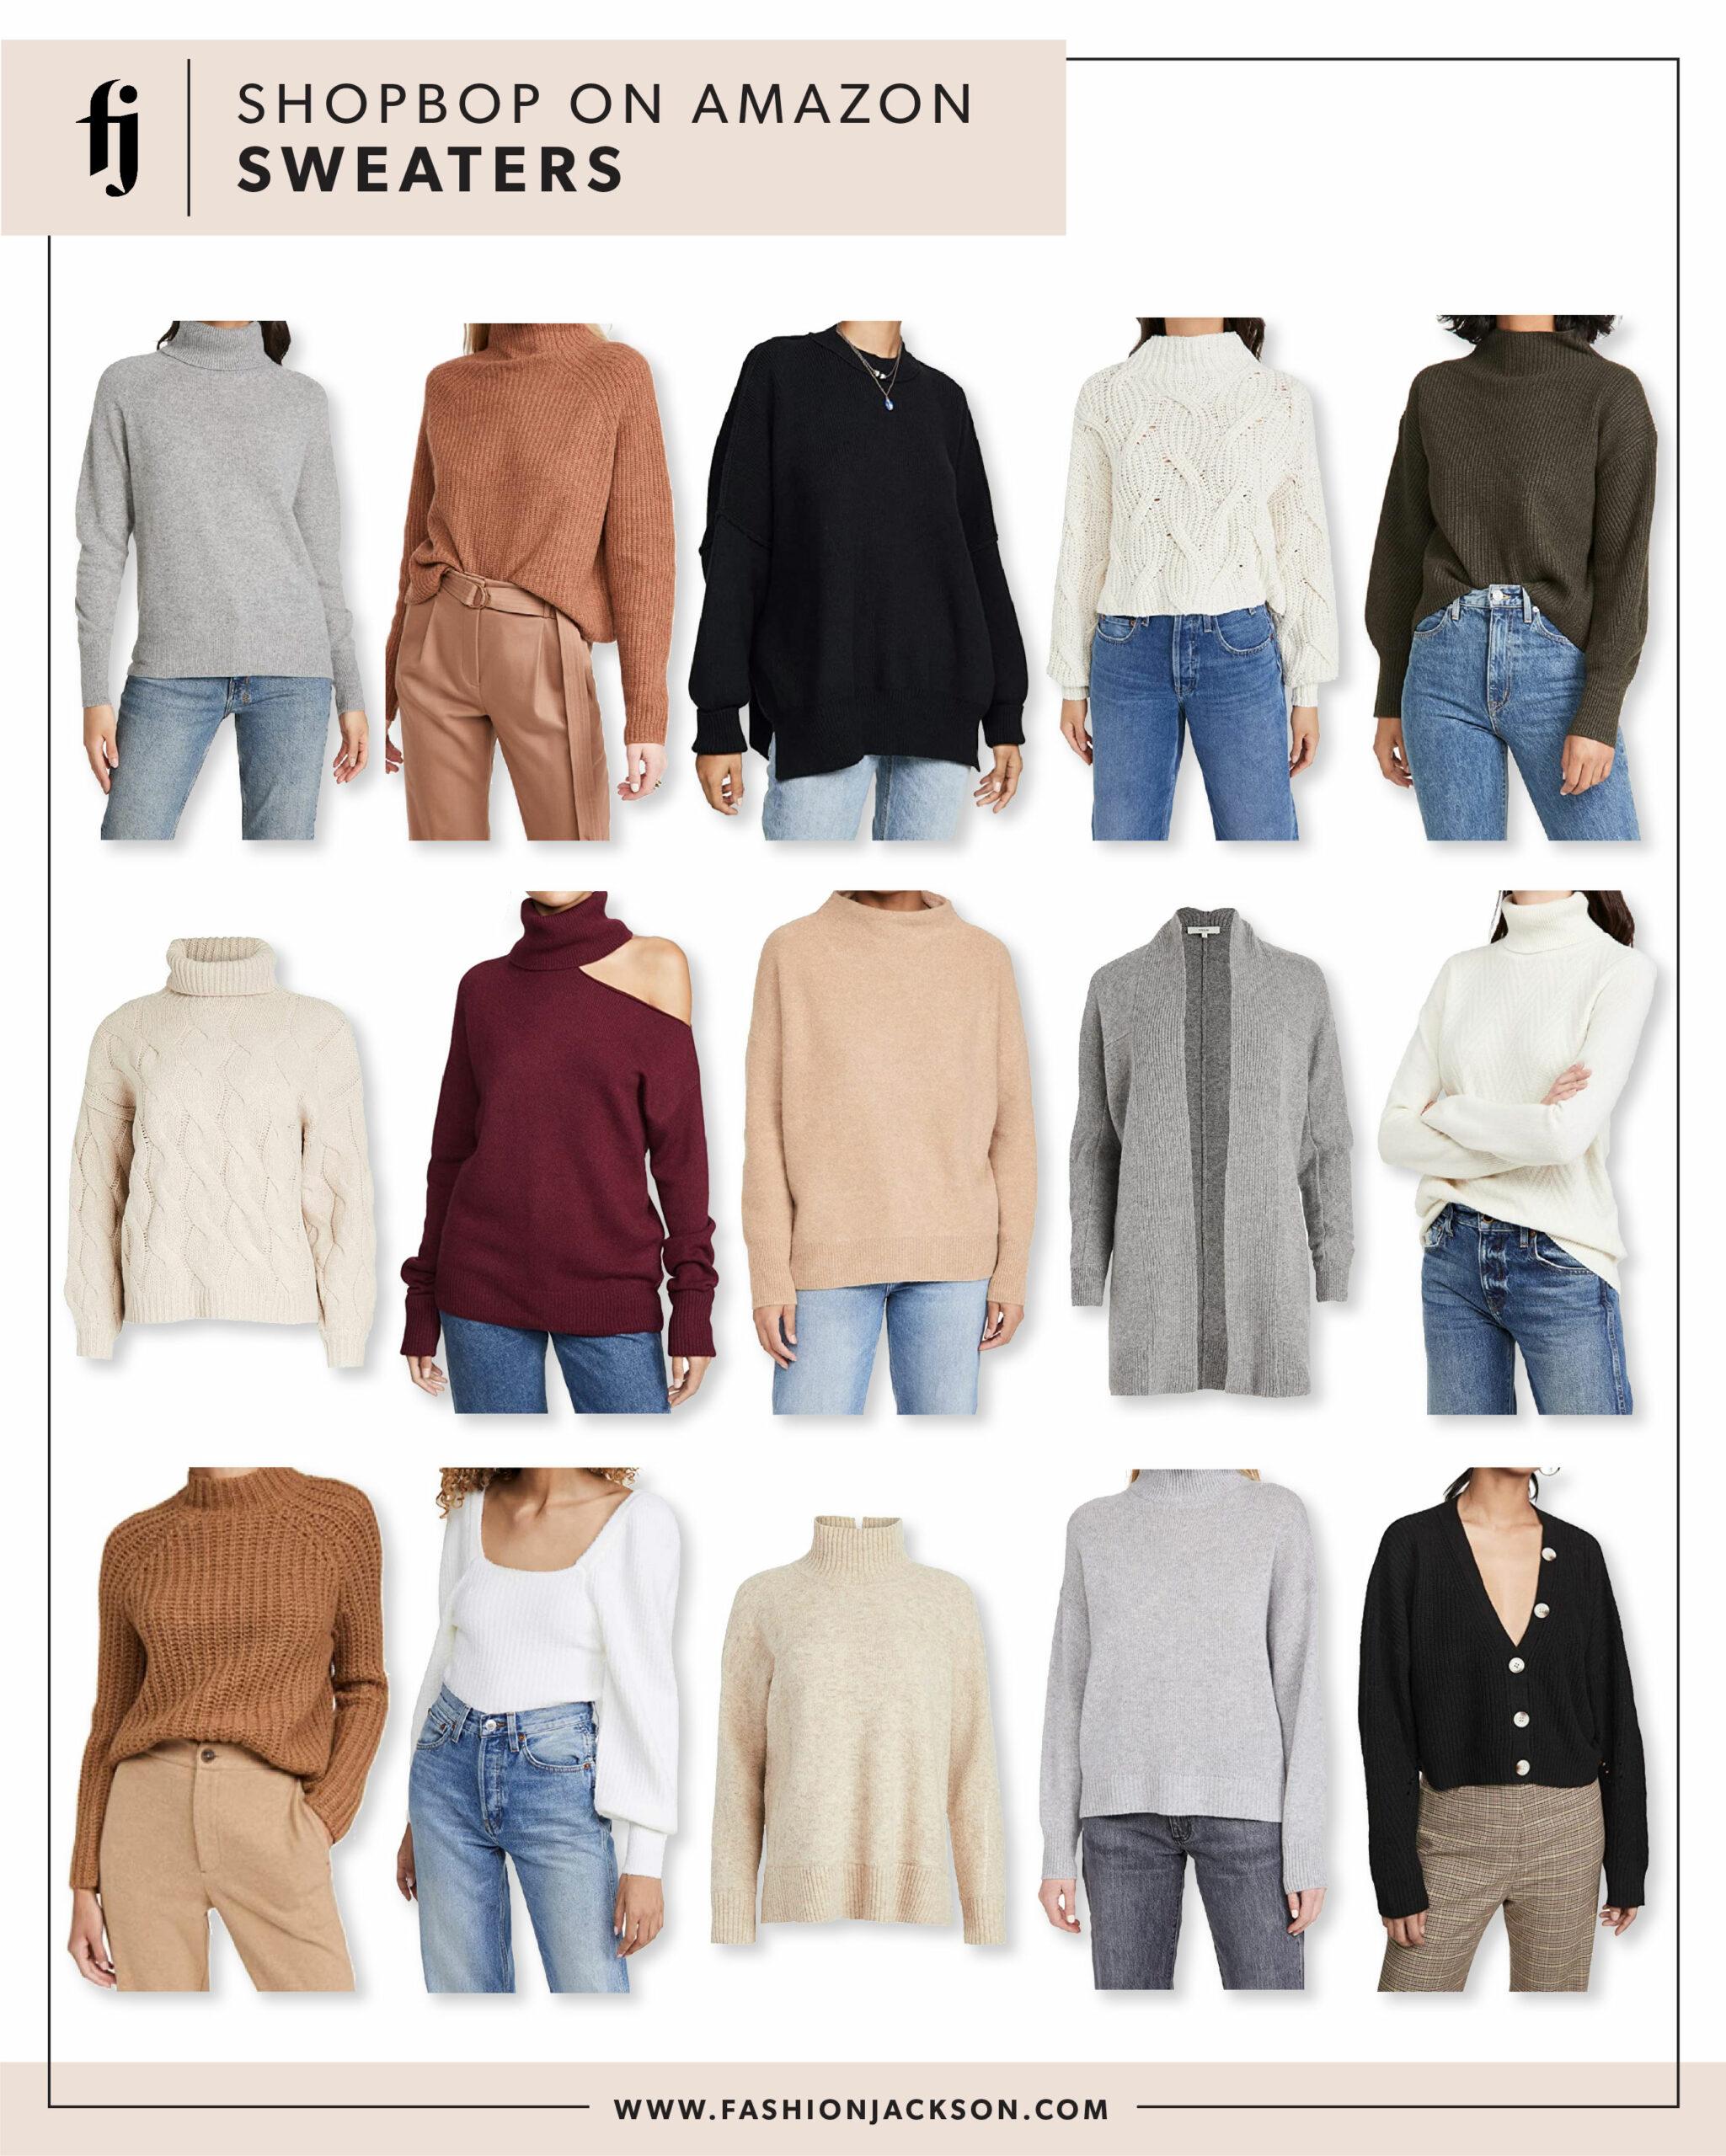 Shopbop Sweaters